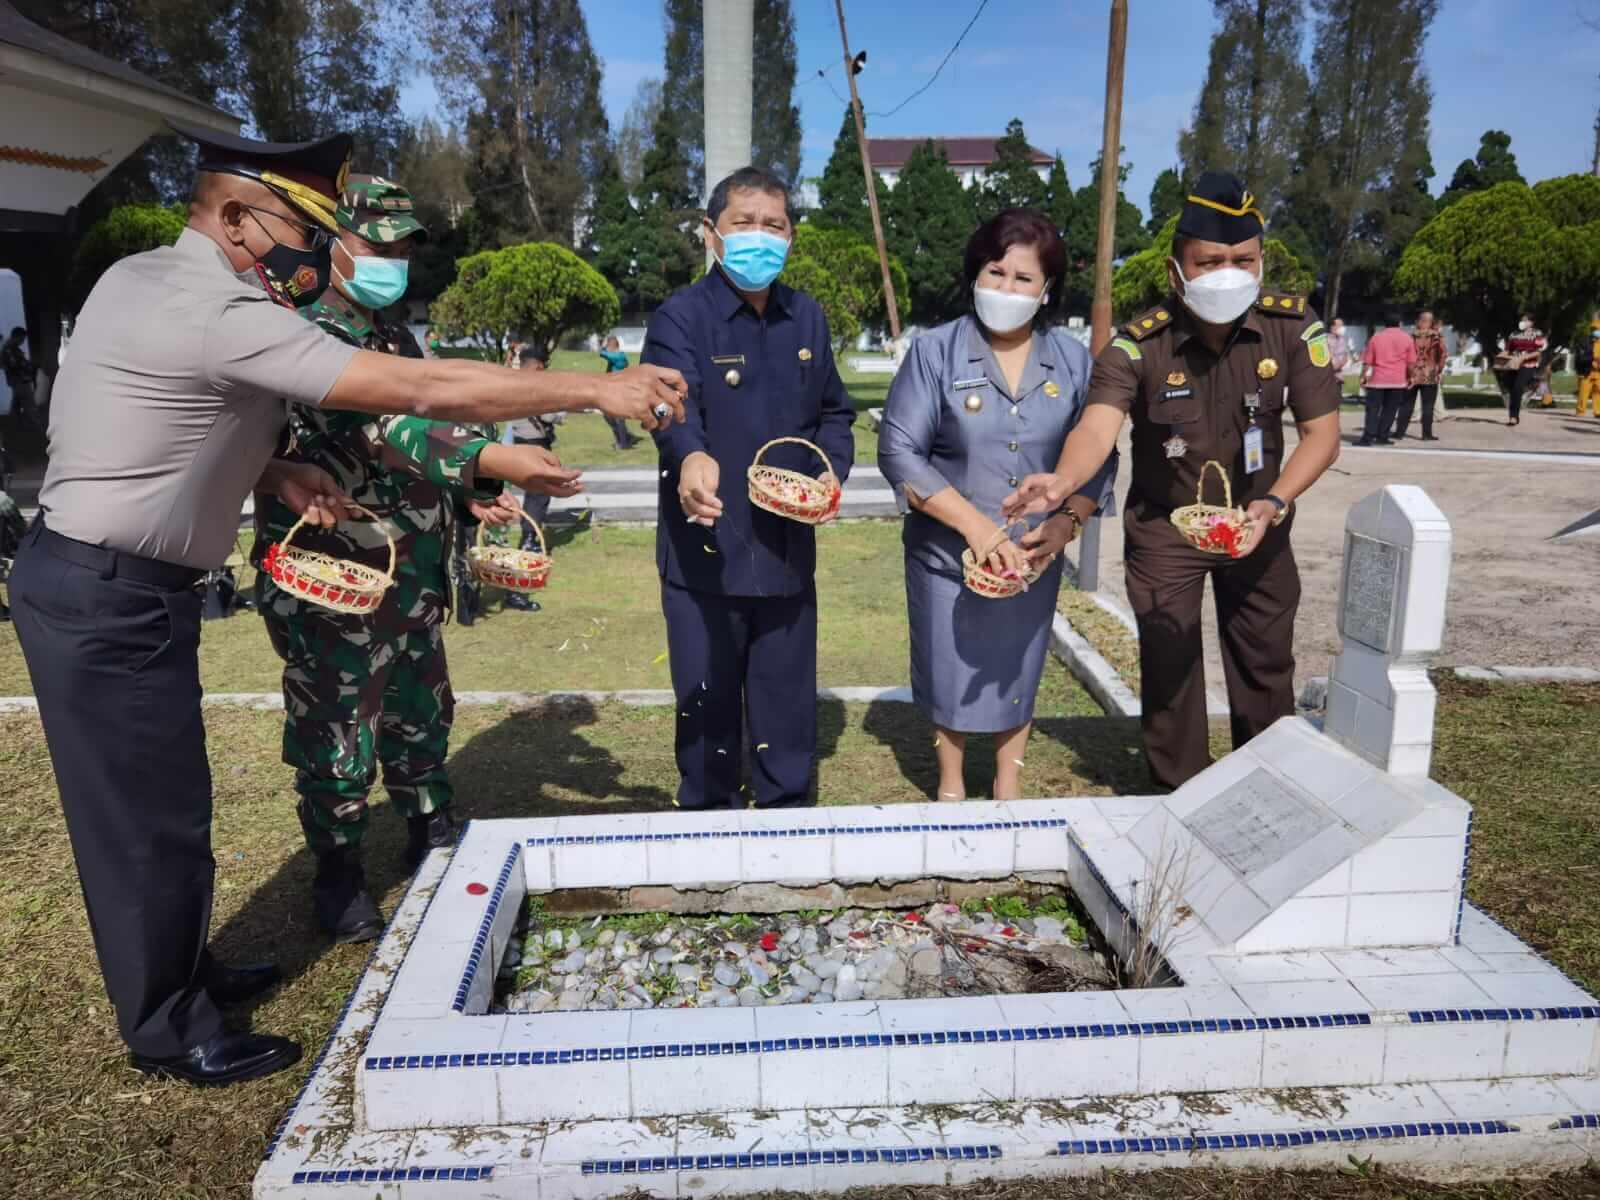 Bupati Karo Bersama Wakil Bupati Karo didampingi Perwakilan Forkopimda adakan kegiatan Tabur Bunga bersama, Di Makam Pahlawan Kabanjahe. Jumat,(9/4/2021)